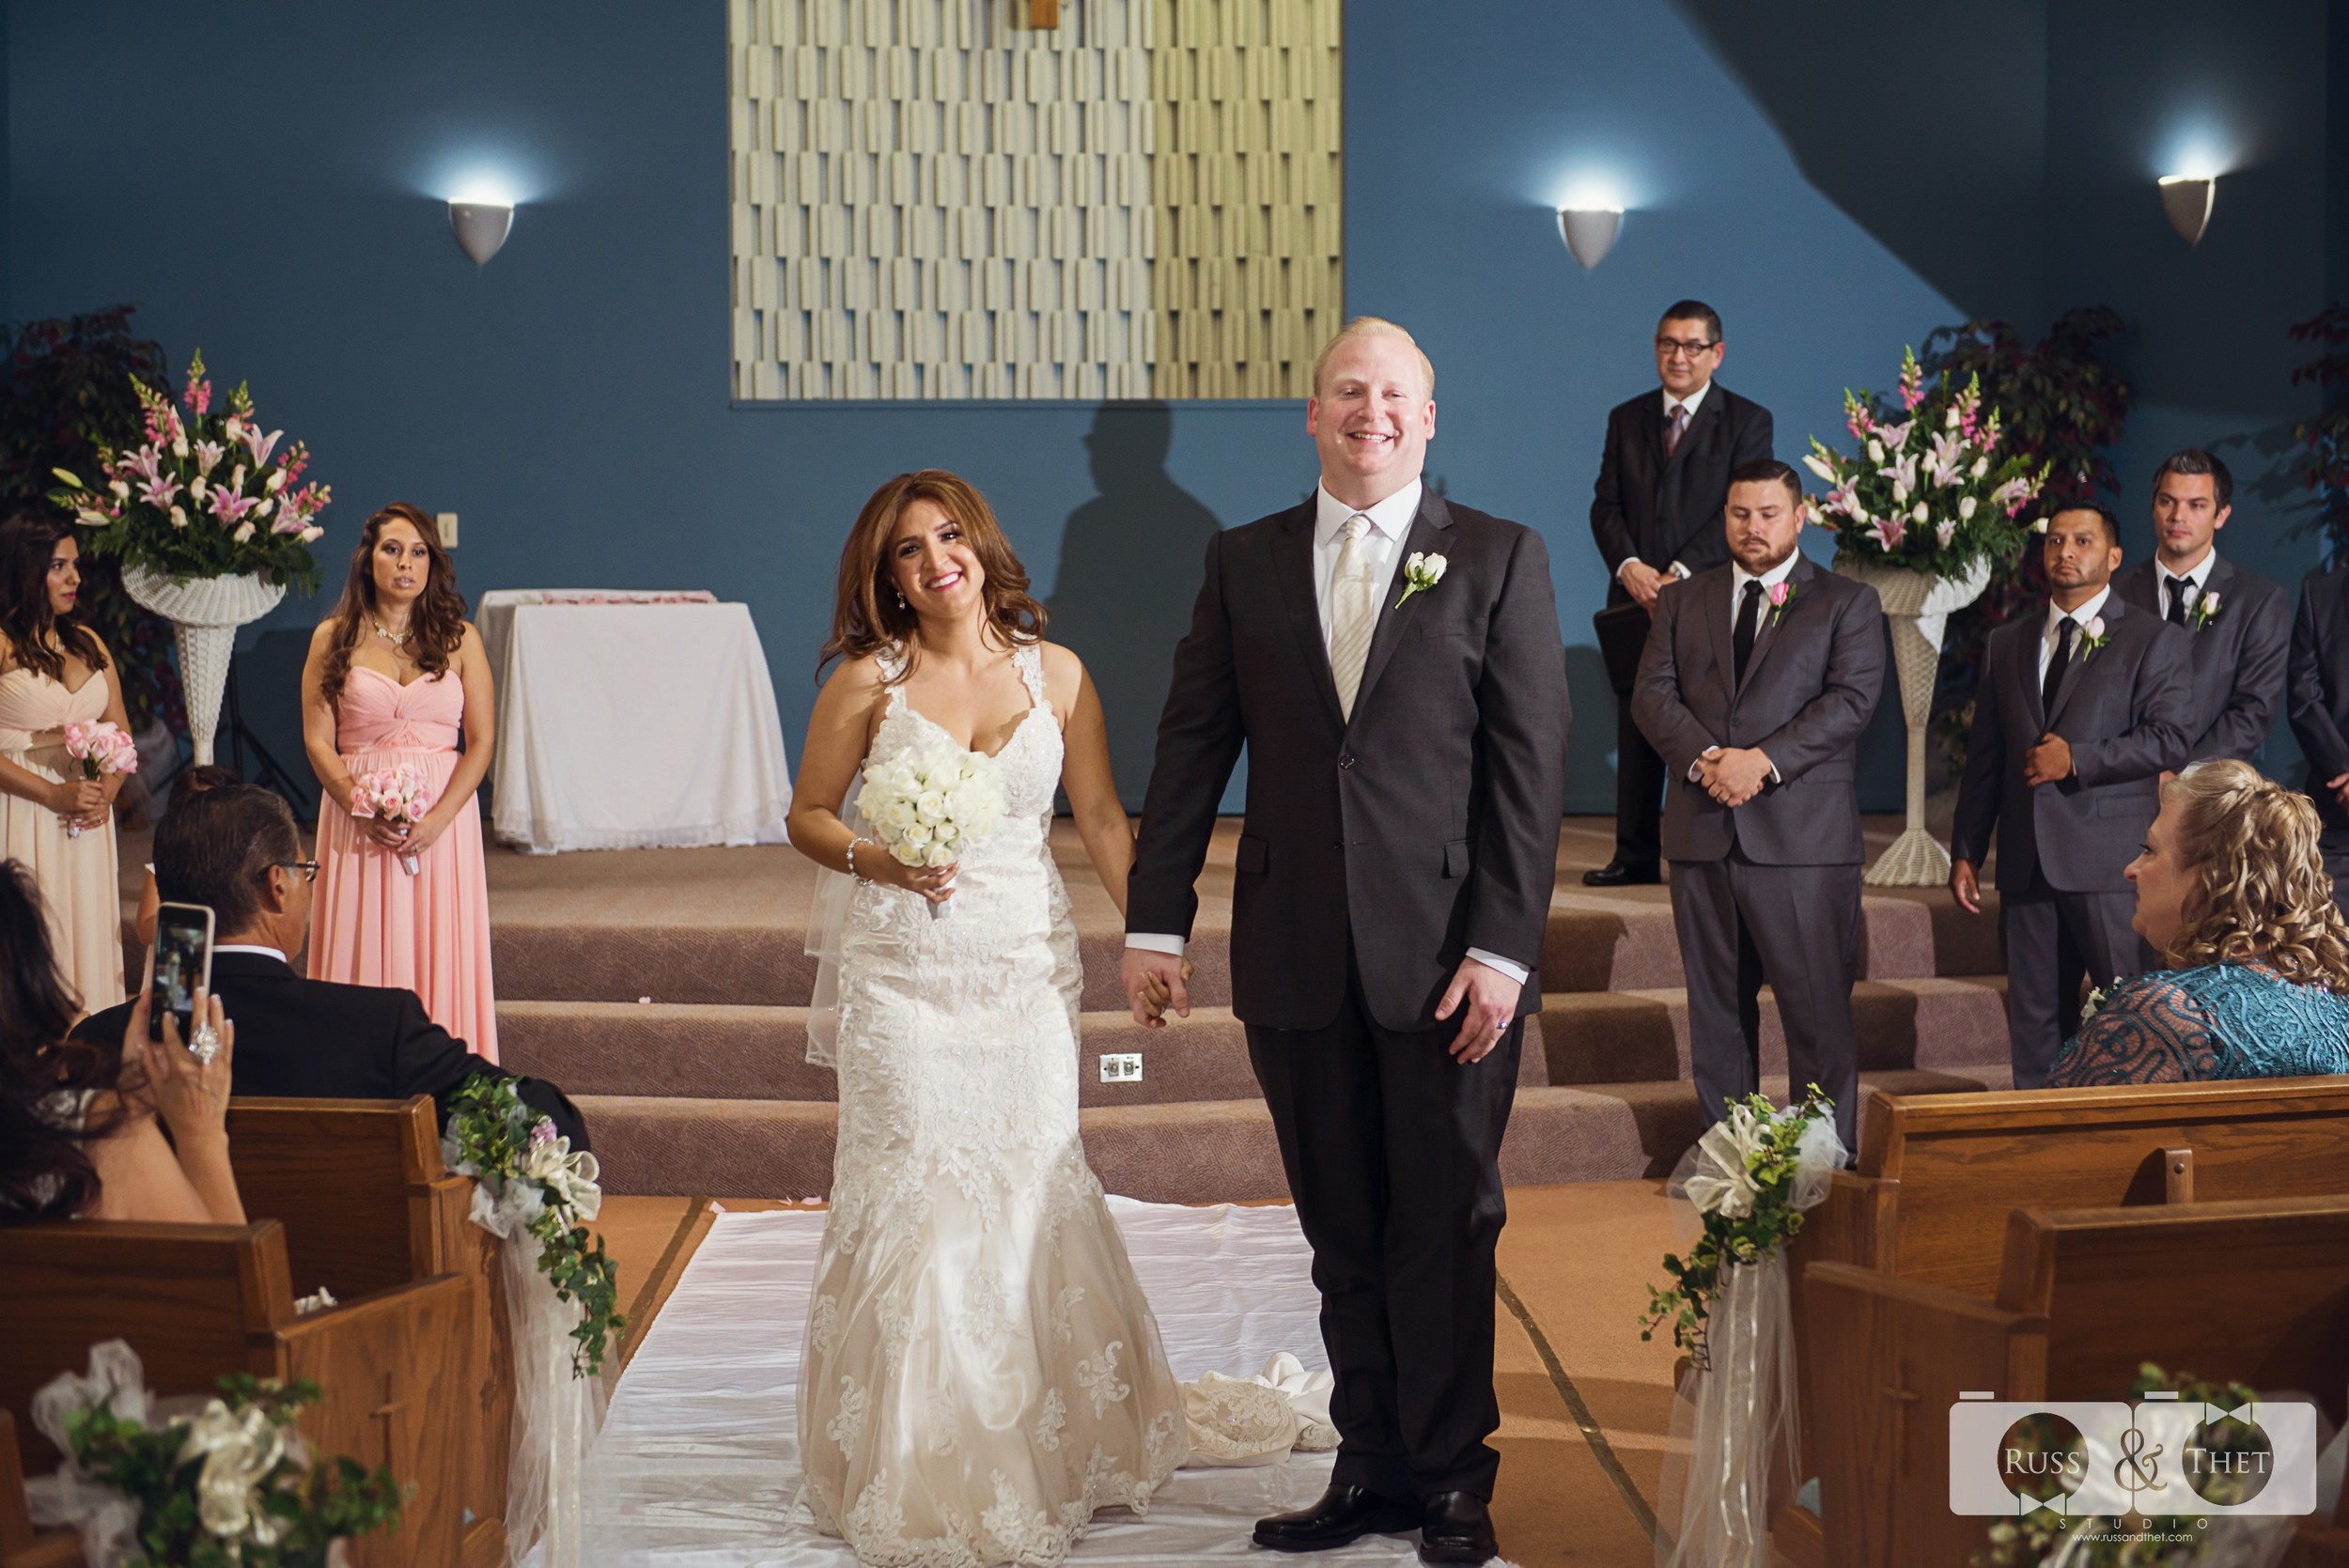 Andrew-and-Christina-Downey-Wedding-Photographers (31).jpg